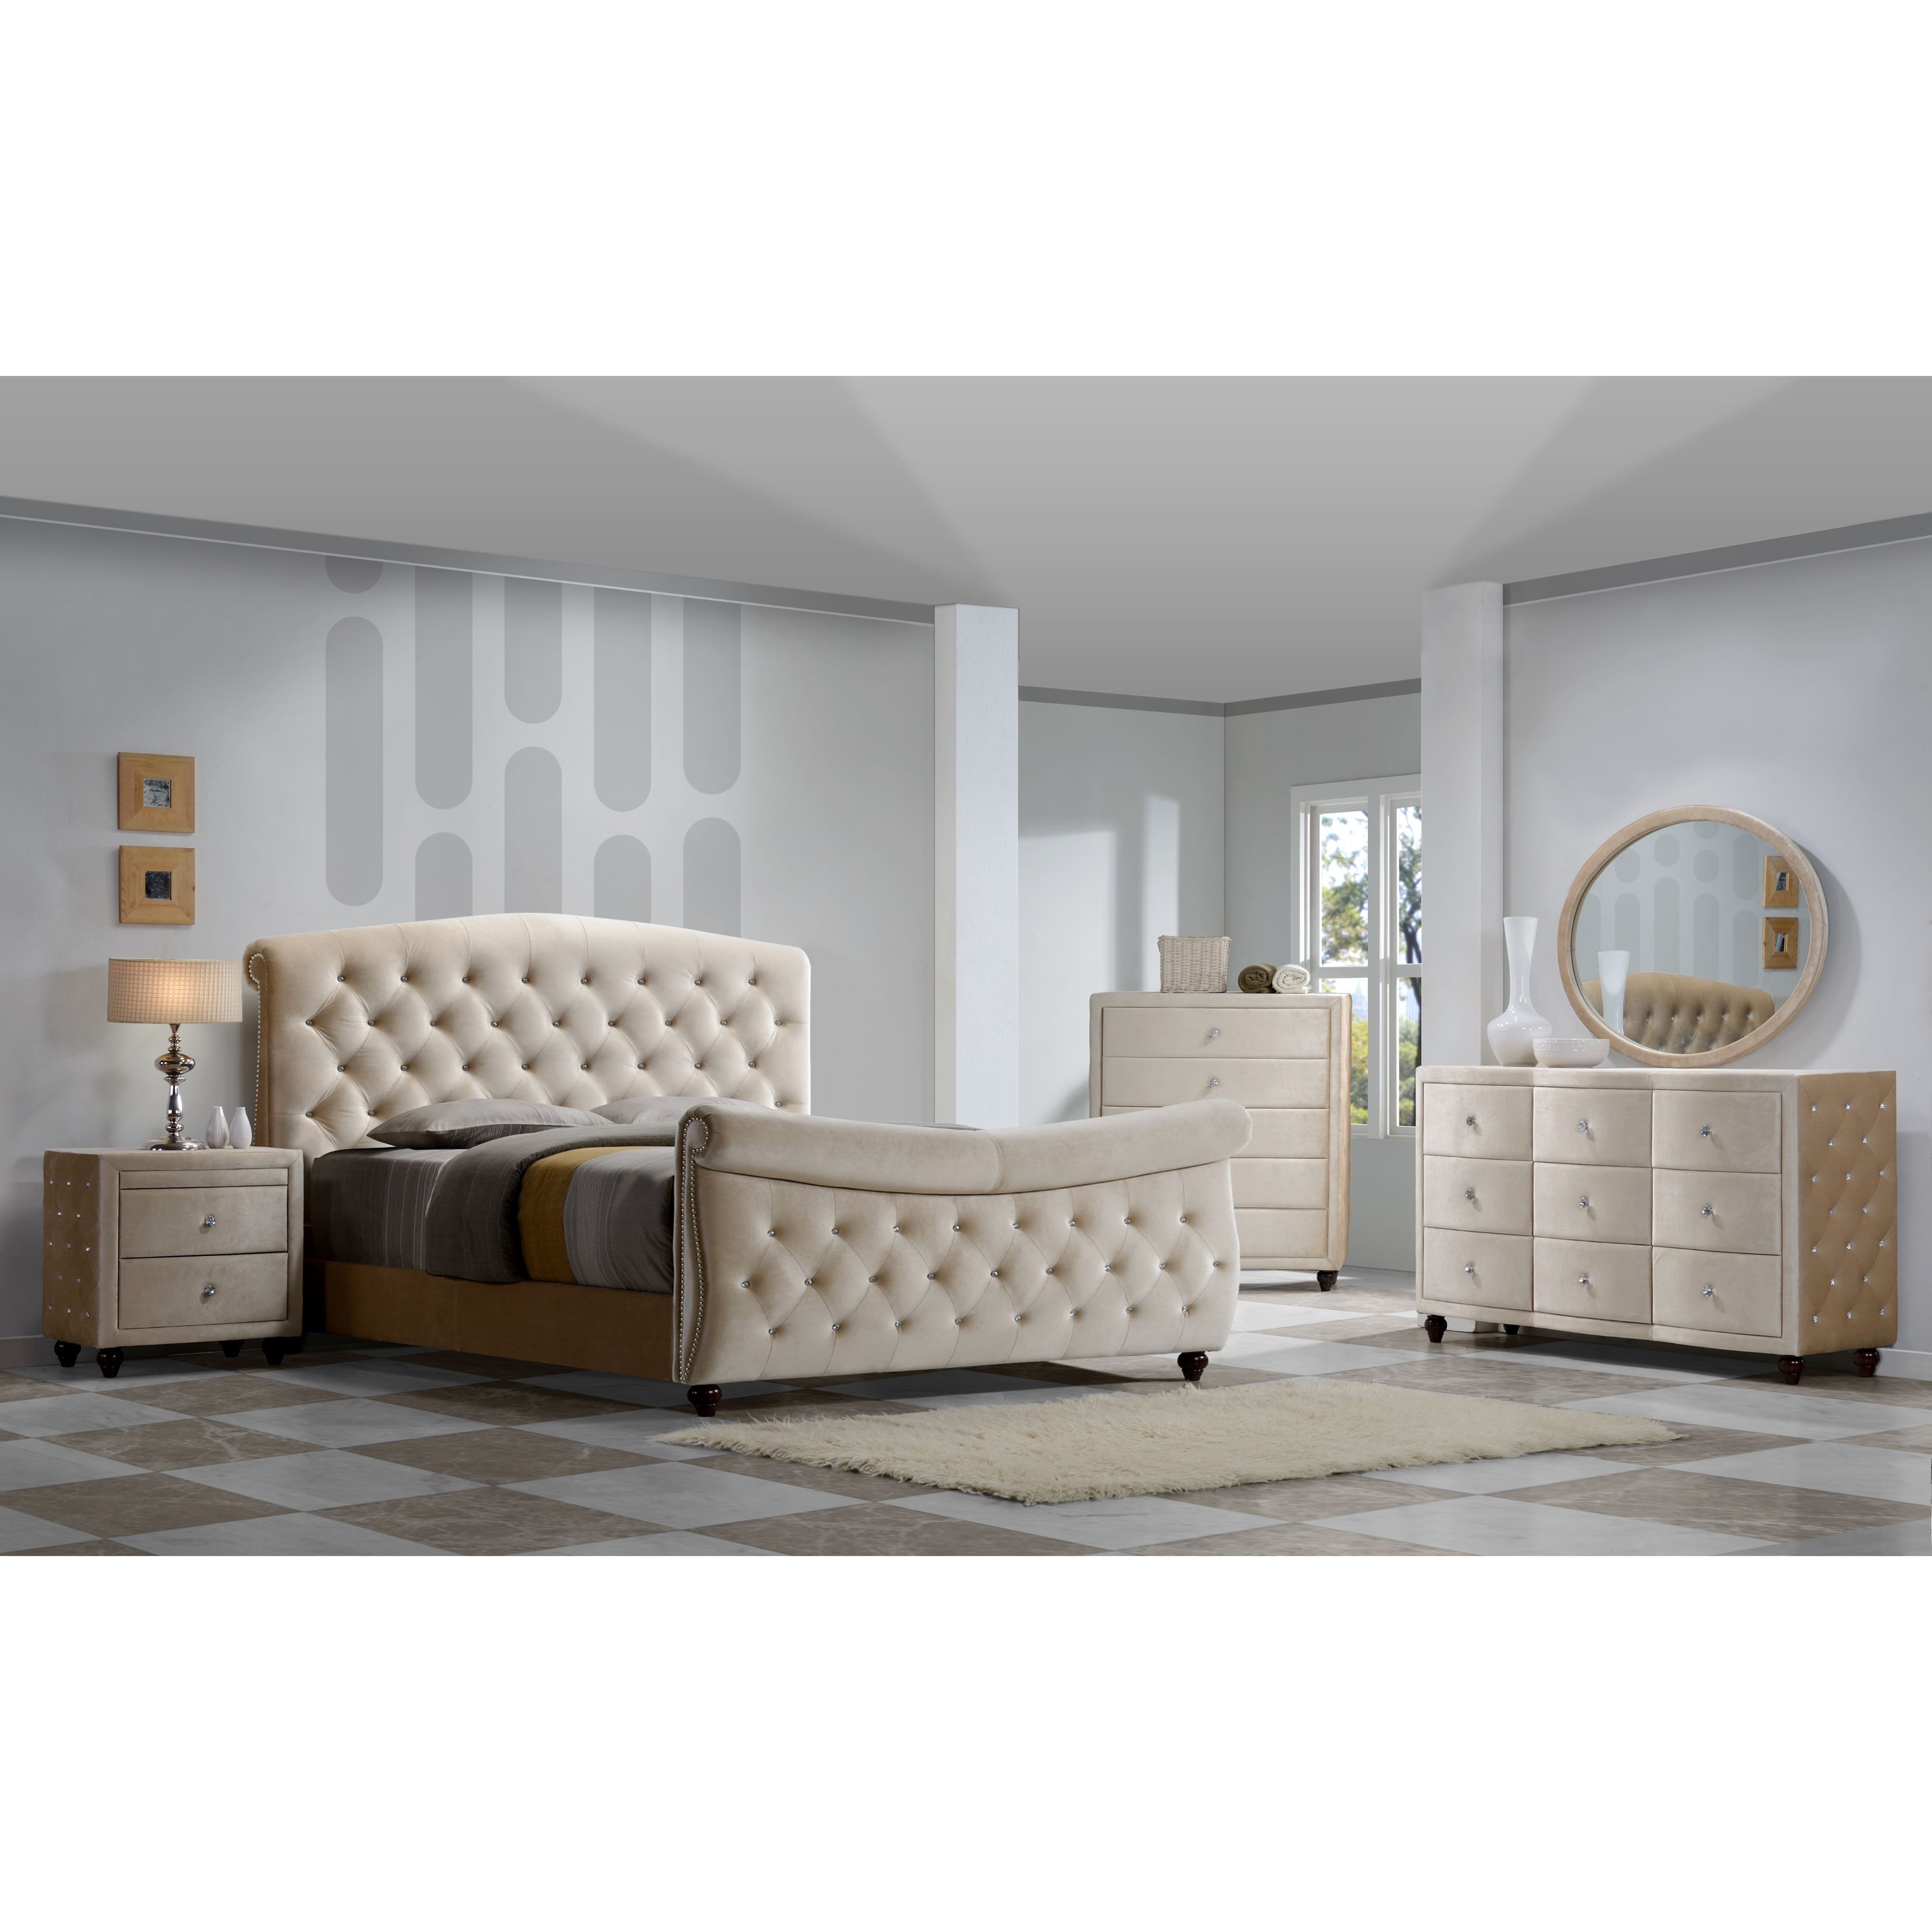 Shop Diamond Golden Beige Velvet Tufted Sleigh Bed   Free Shipping Today    Overstock.com   10991648